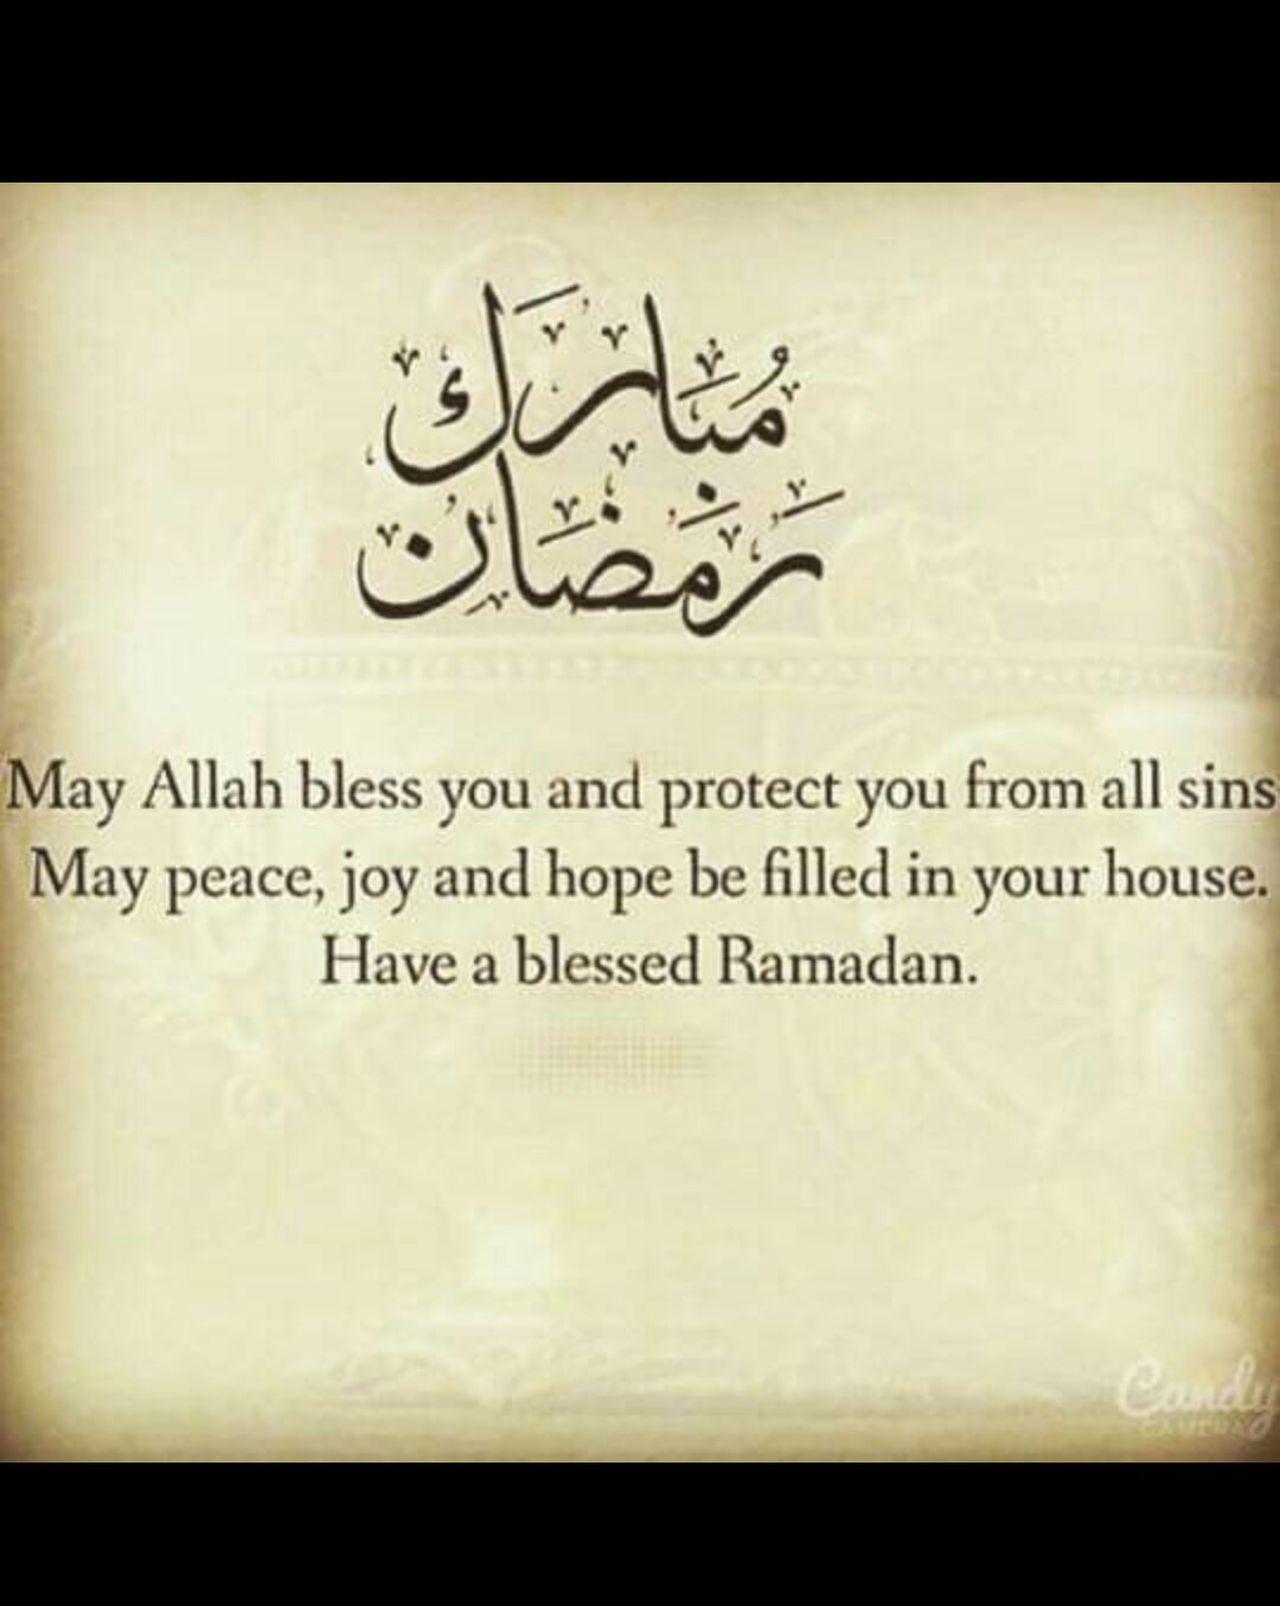 Ramadan Kareem Holymonthoframadam Joy Recharging Imaan Healing Your Heart Feeding Your Soul